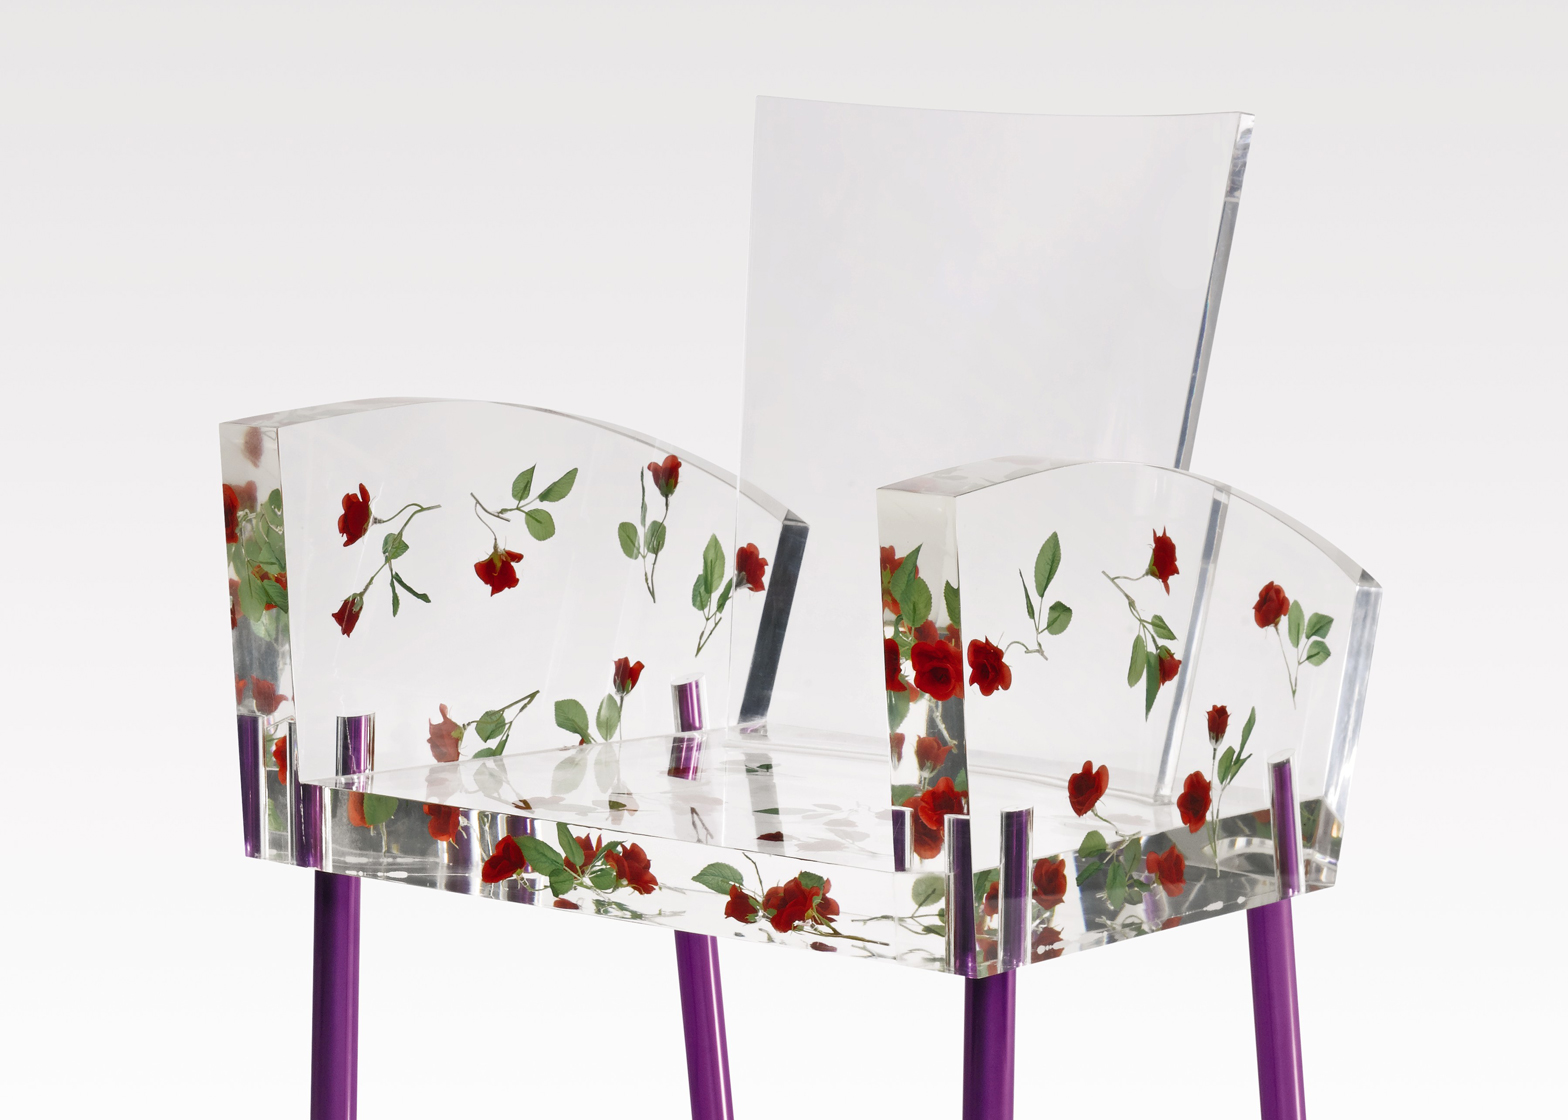 Miss Blanche Chair by Shiro Kuramata